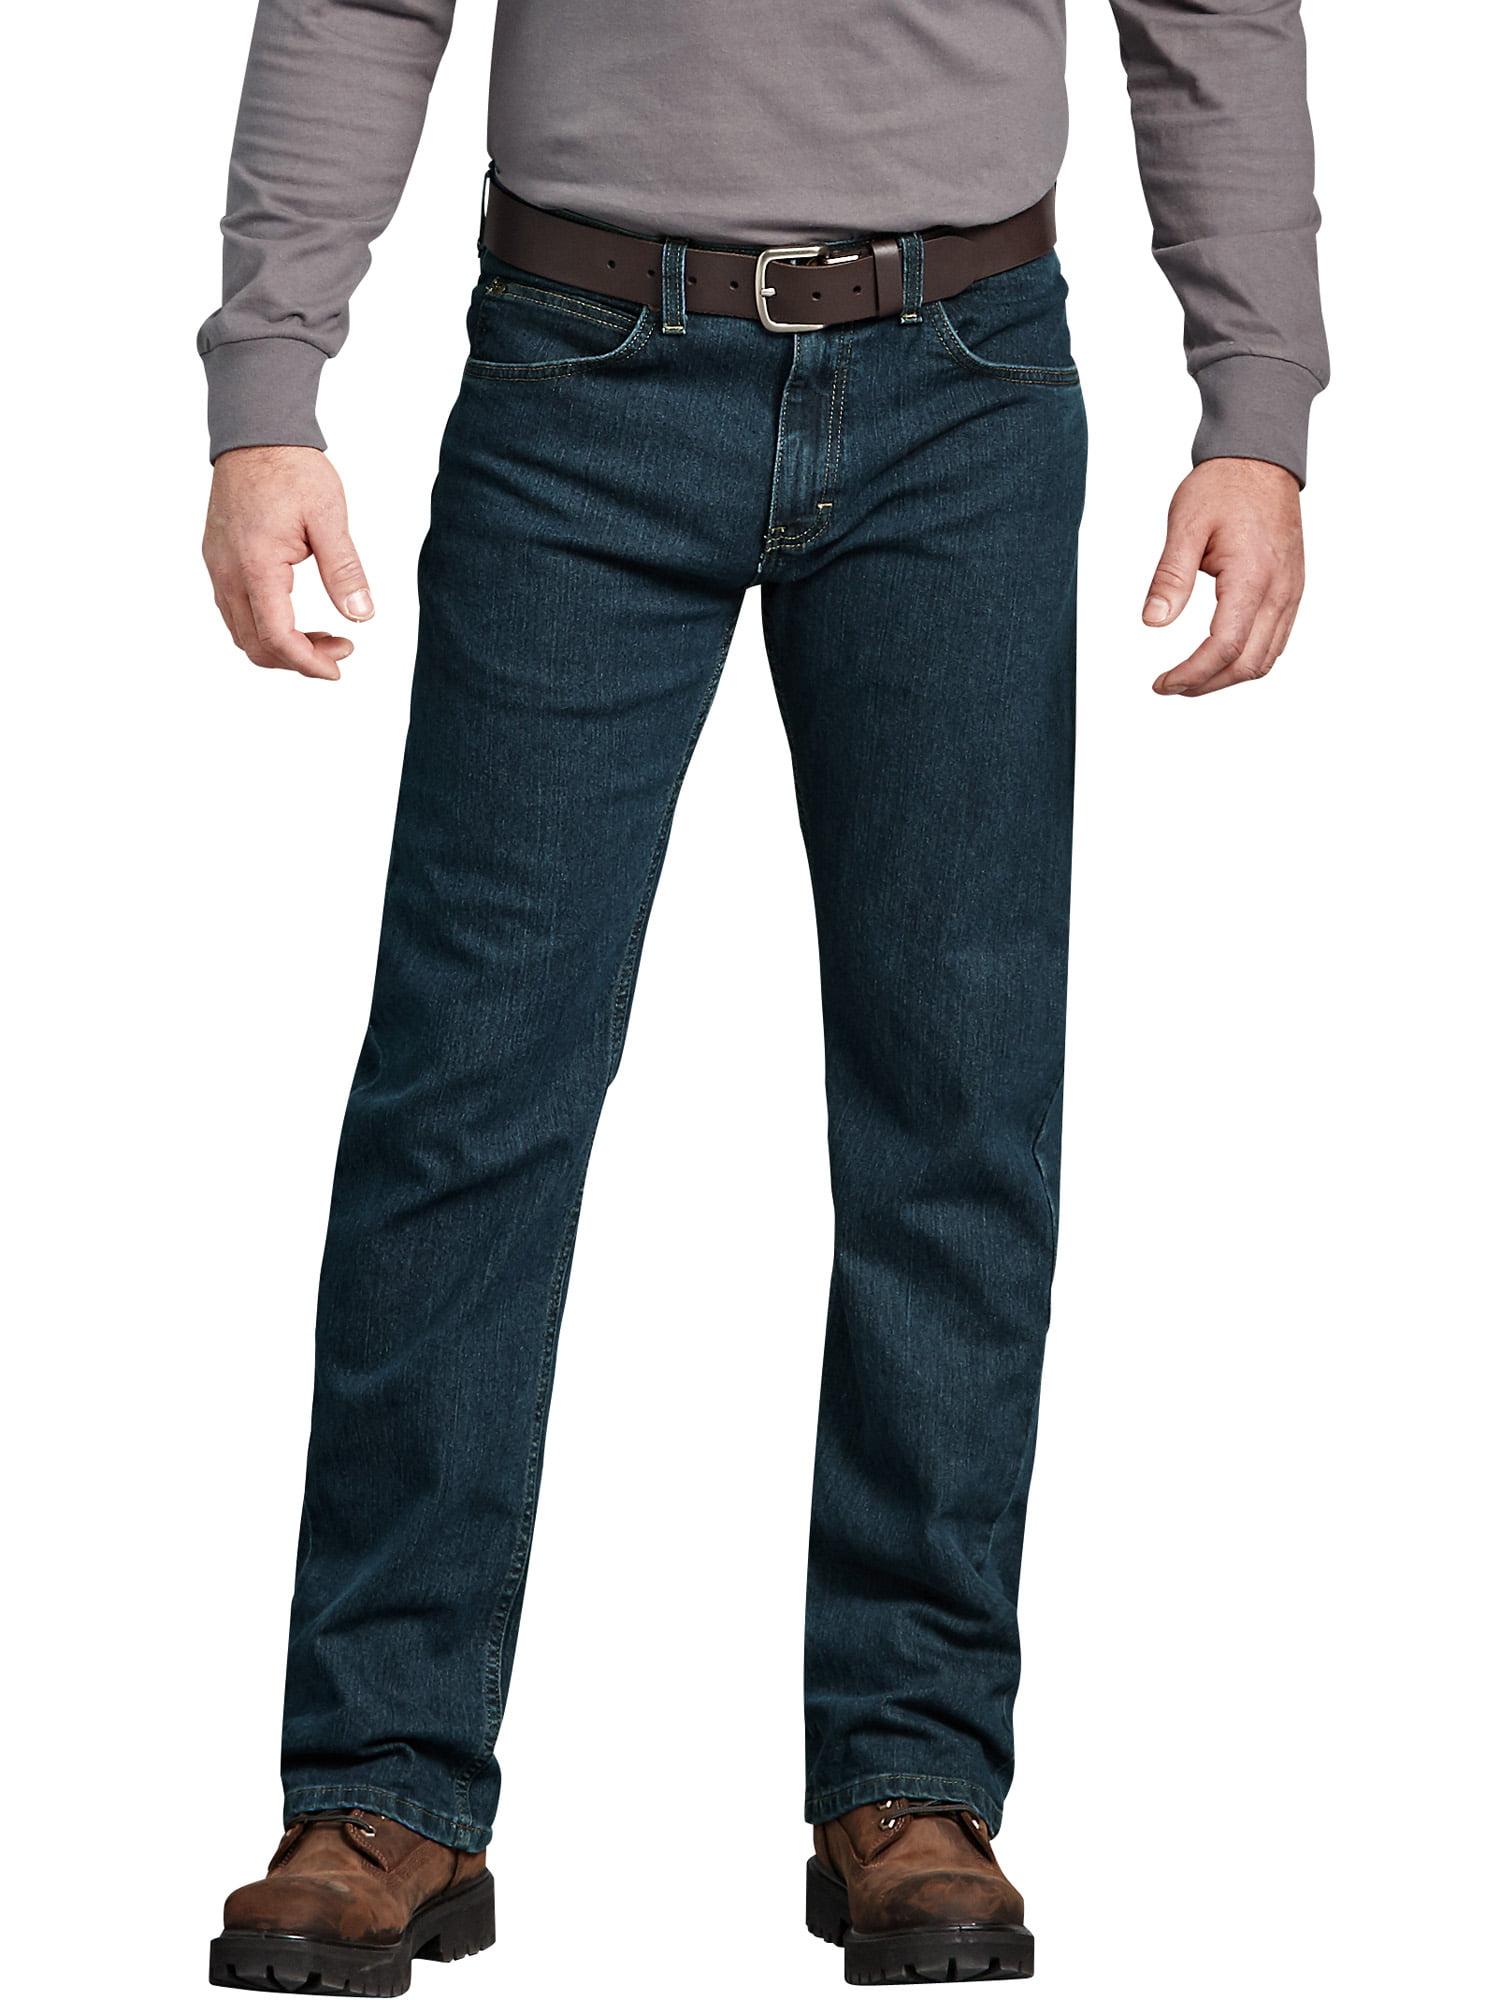 392e3ace22b Dickies - Men s Regular Fit Performance Flex 5-Pocket Jean - Walmart.com